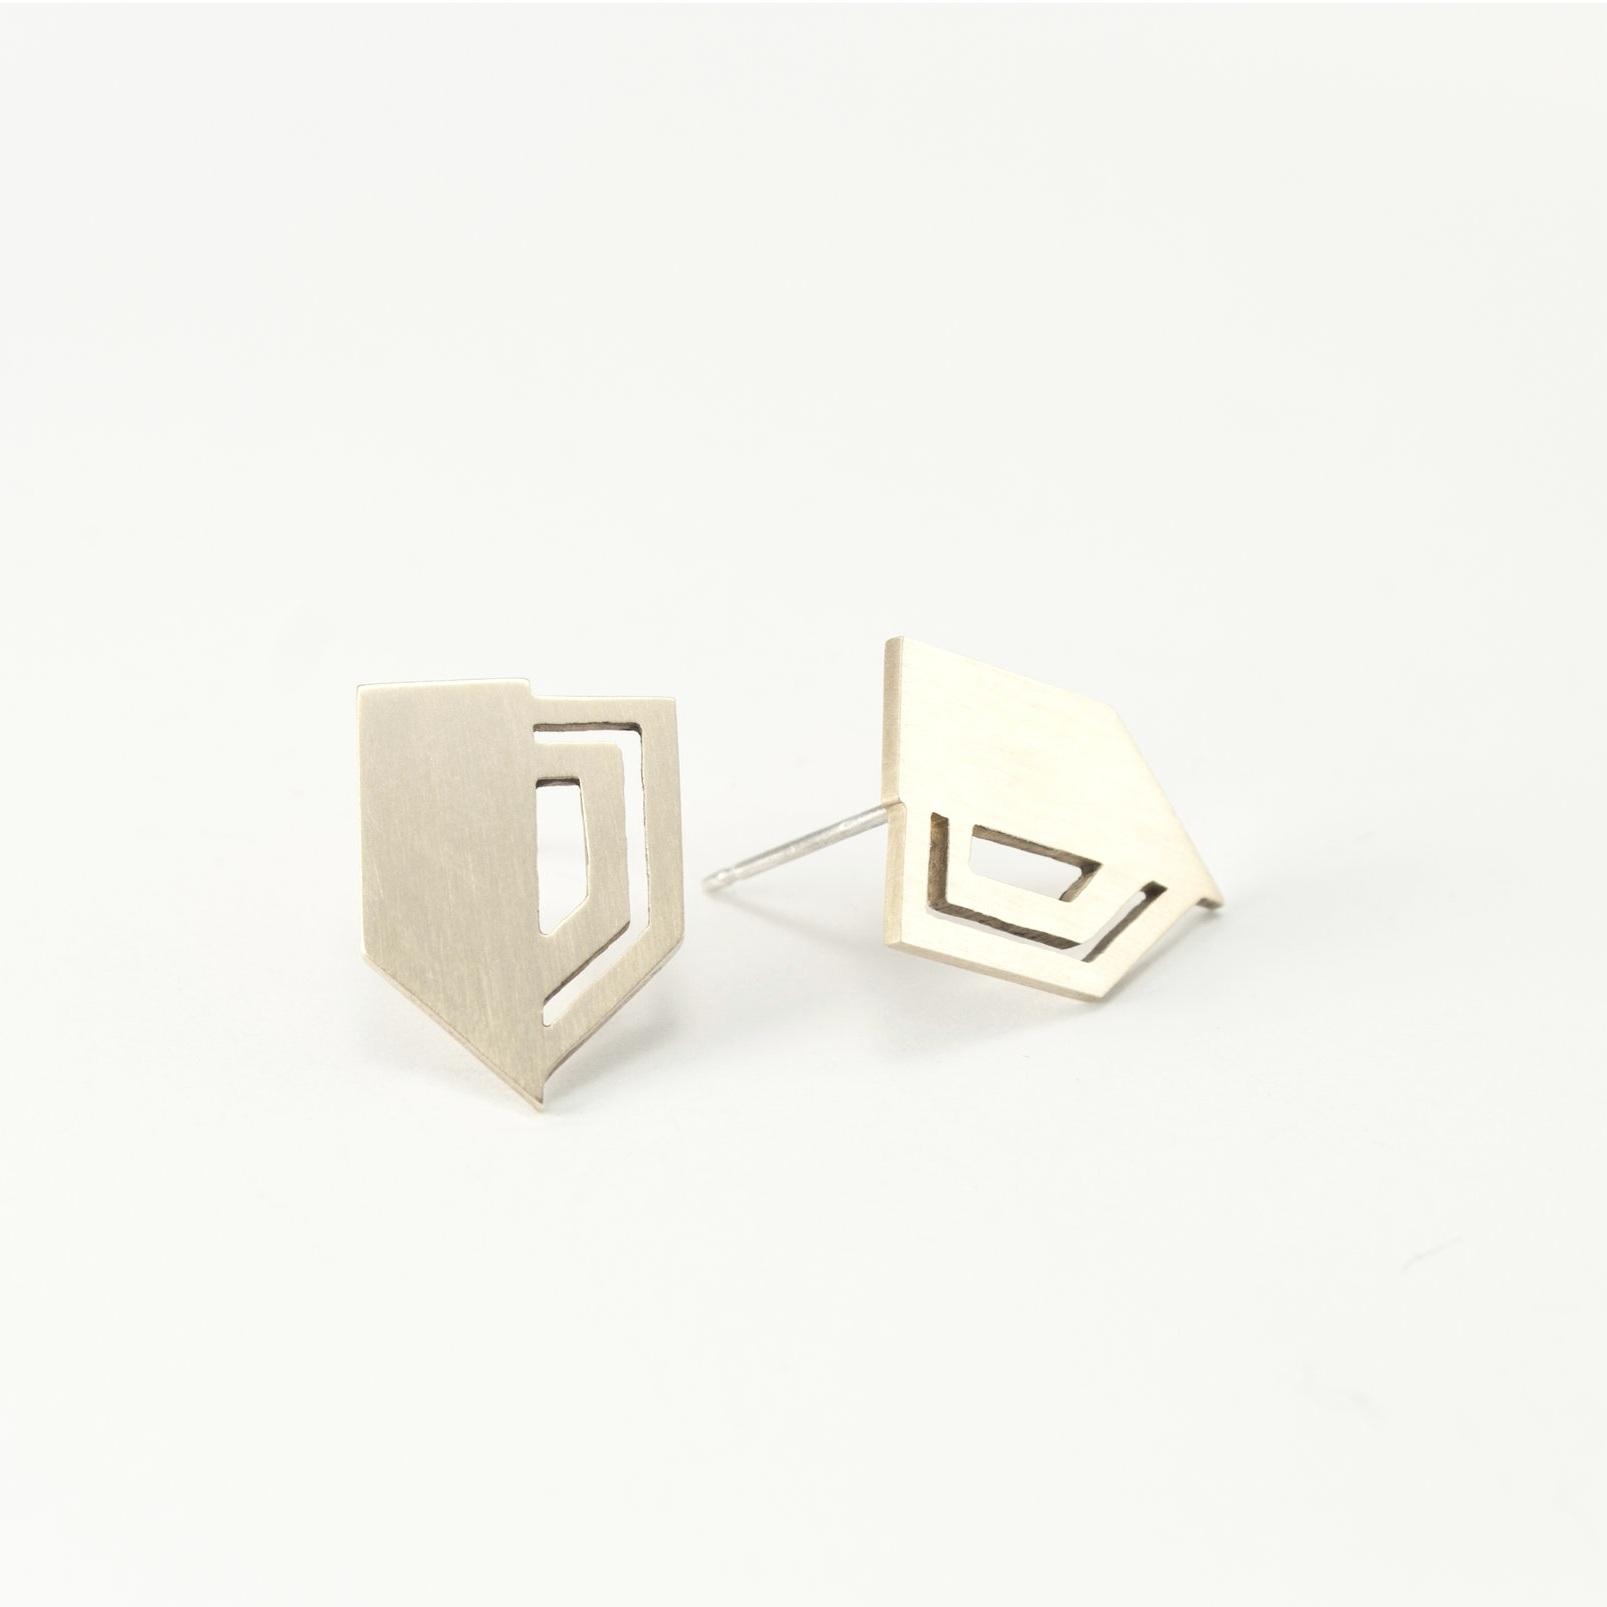 lindsey+snell+badge+earrings